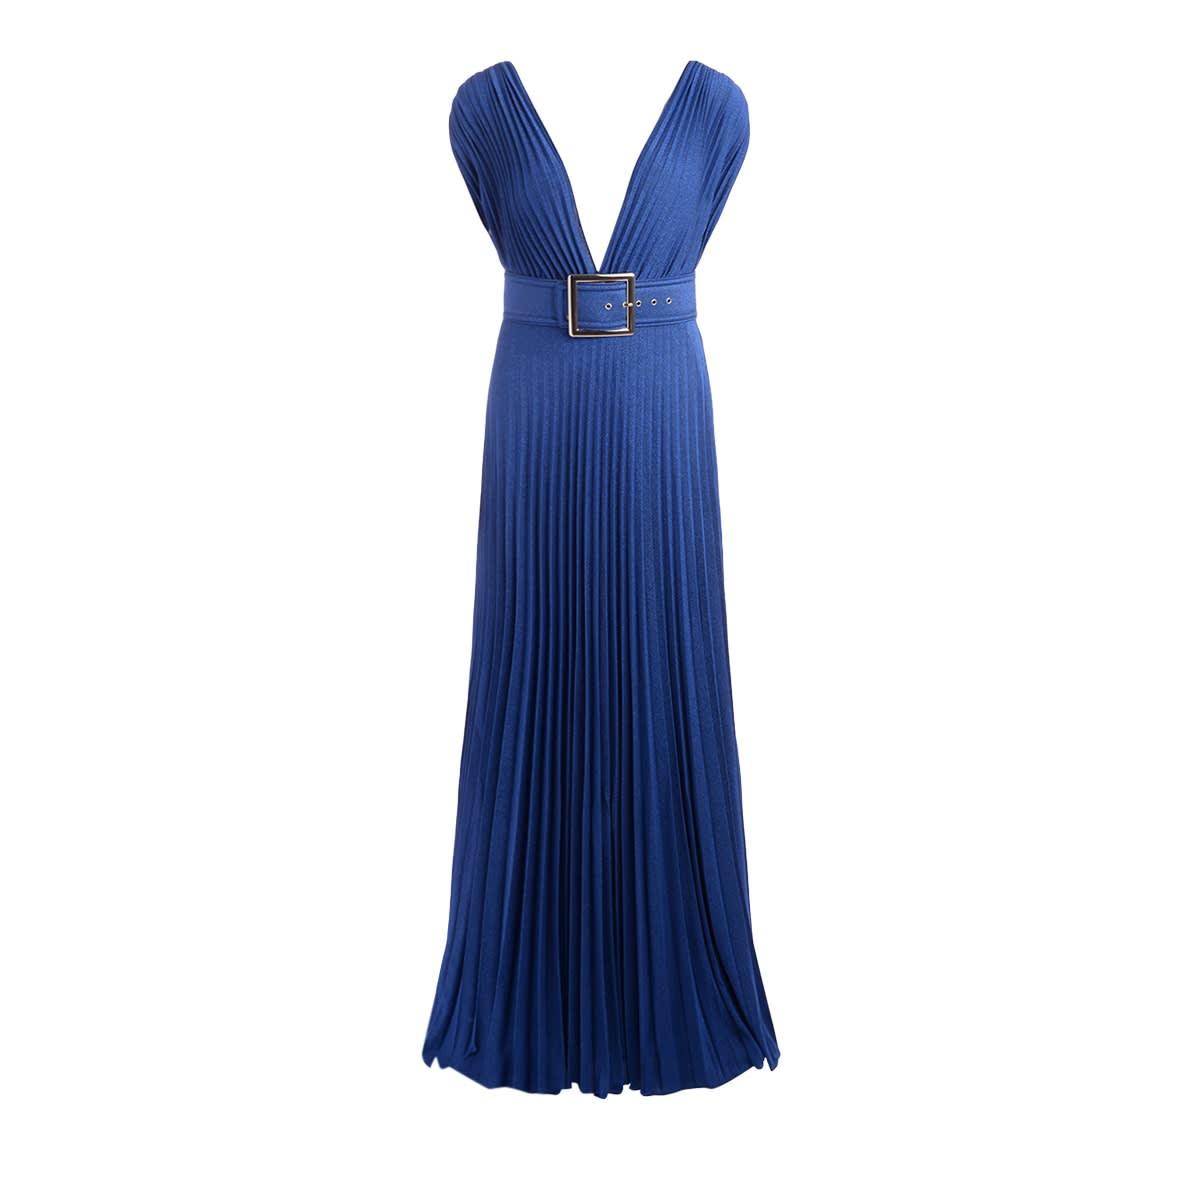 Buy Elisabetta Franchi Dress In Cobalt Blue Lurex online, shop Elisabetta Franchi Celyn B. with free shipping